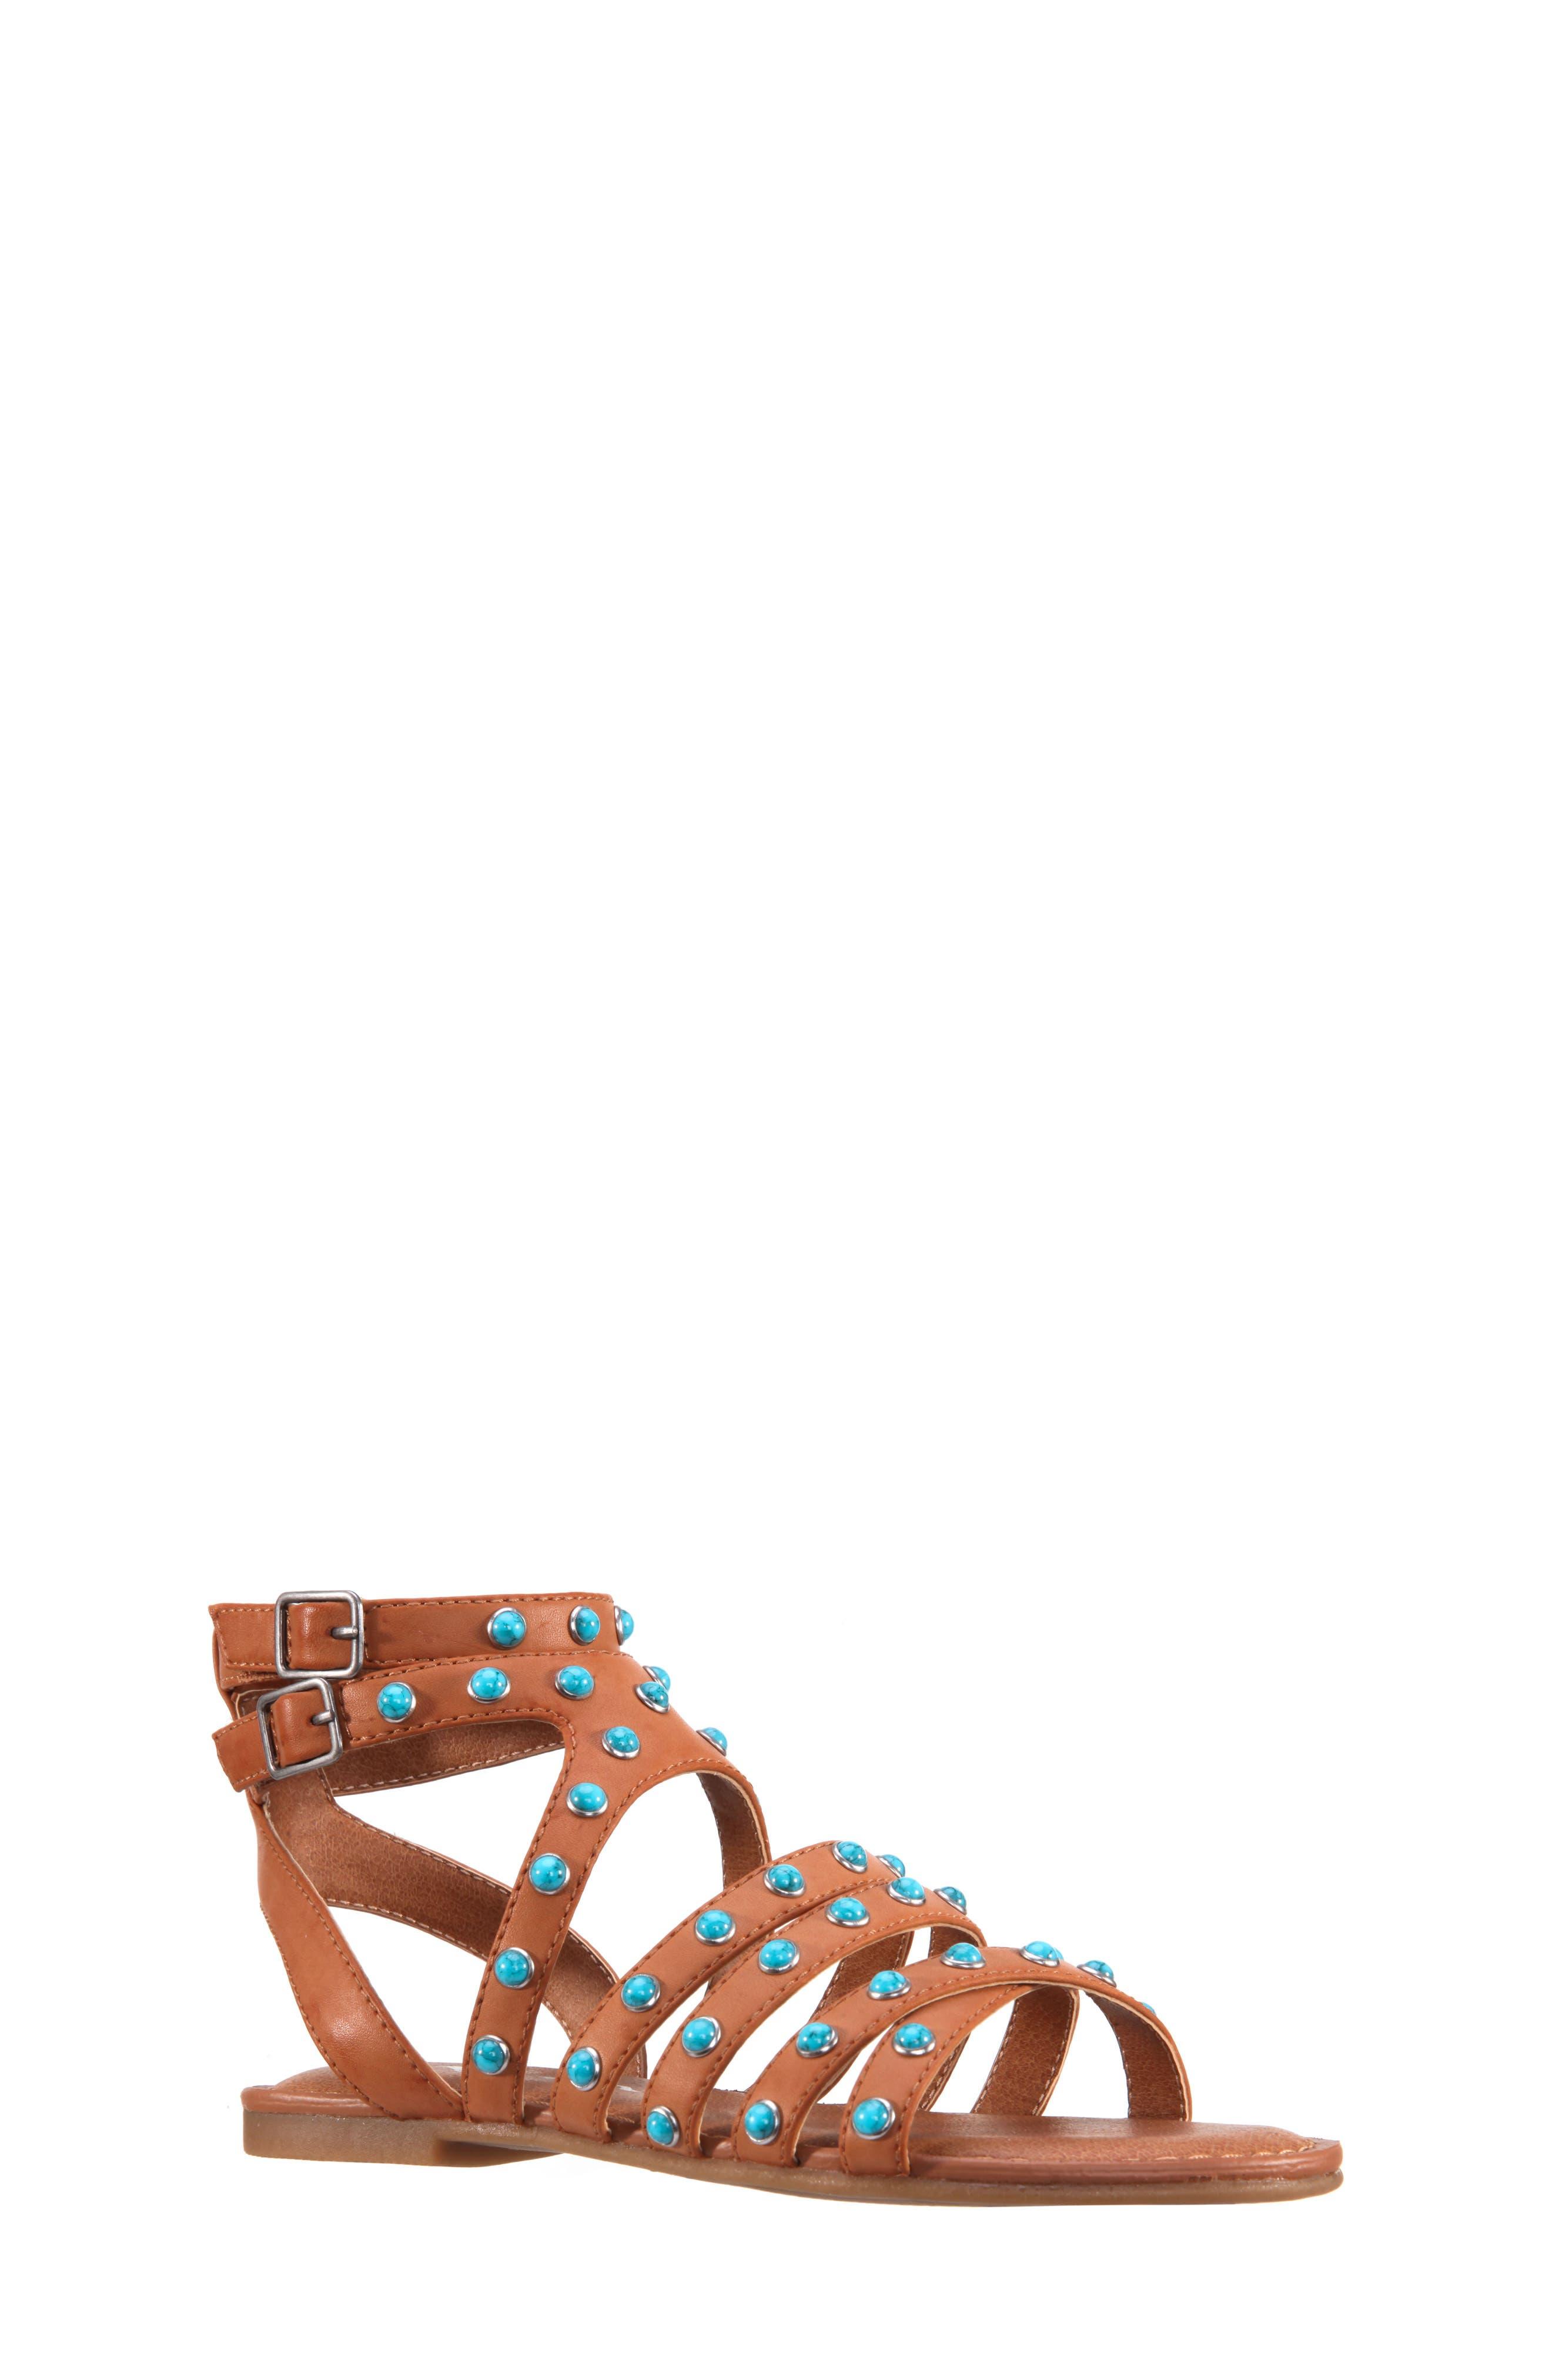 Tammara Studded Gladiator Sandal,                             Main thumbnail 1, color,                             Tan Burnished